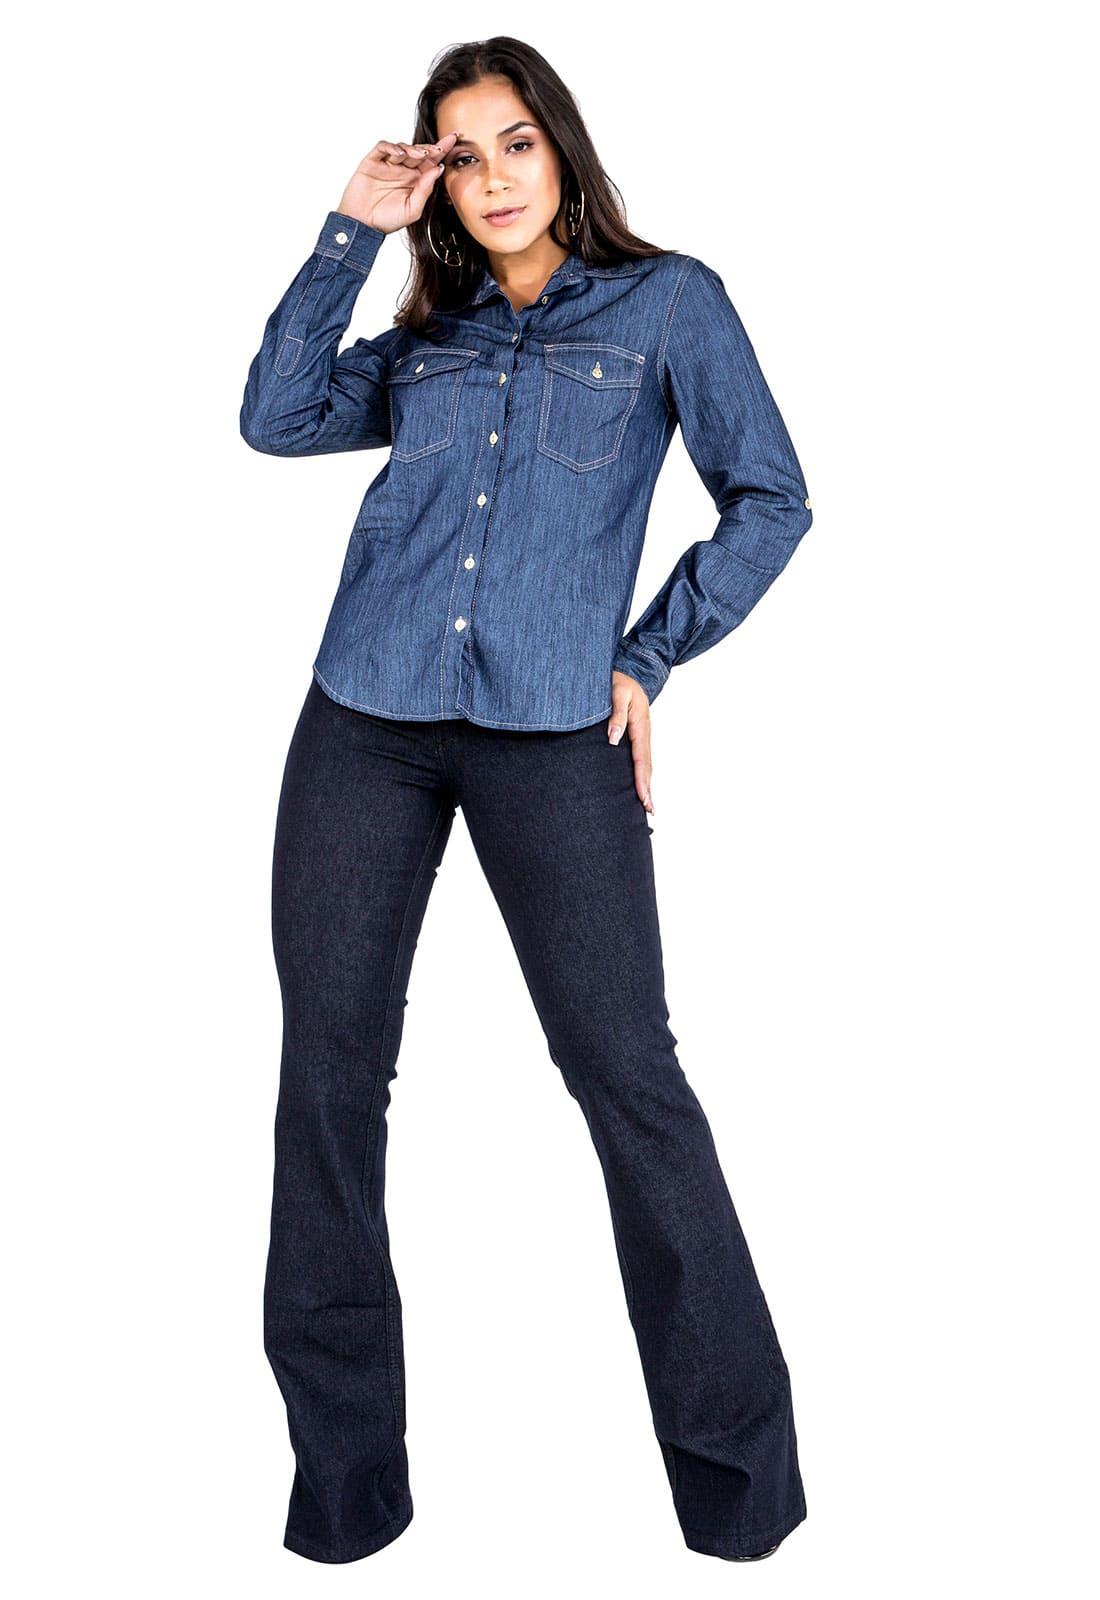 Camisa Jeans Feminina Manga Longa